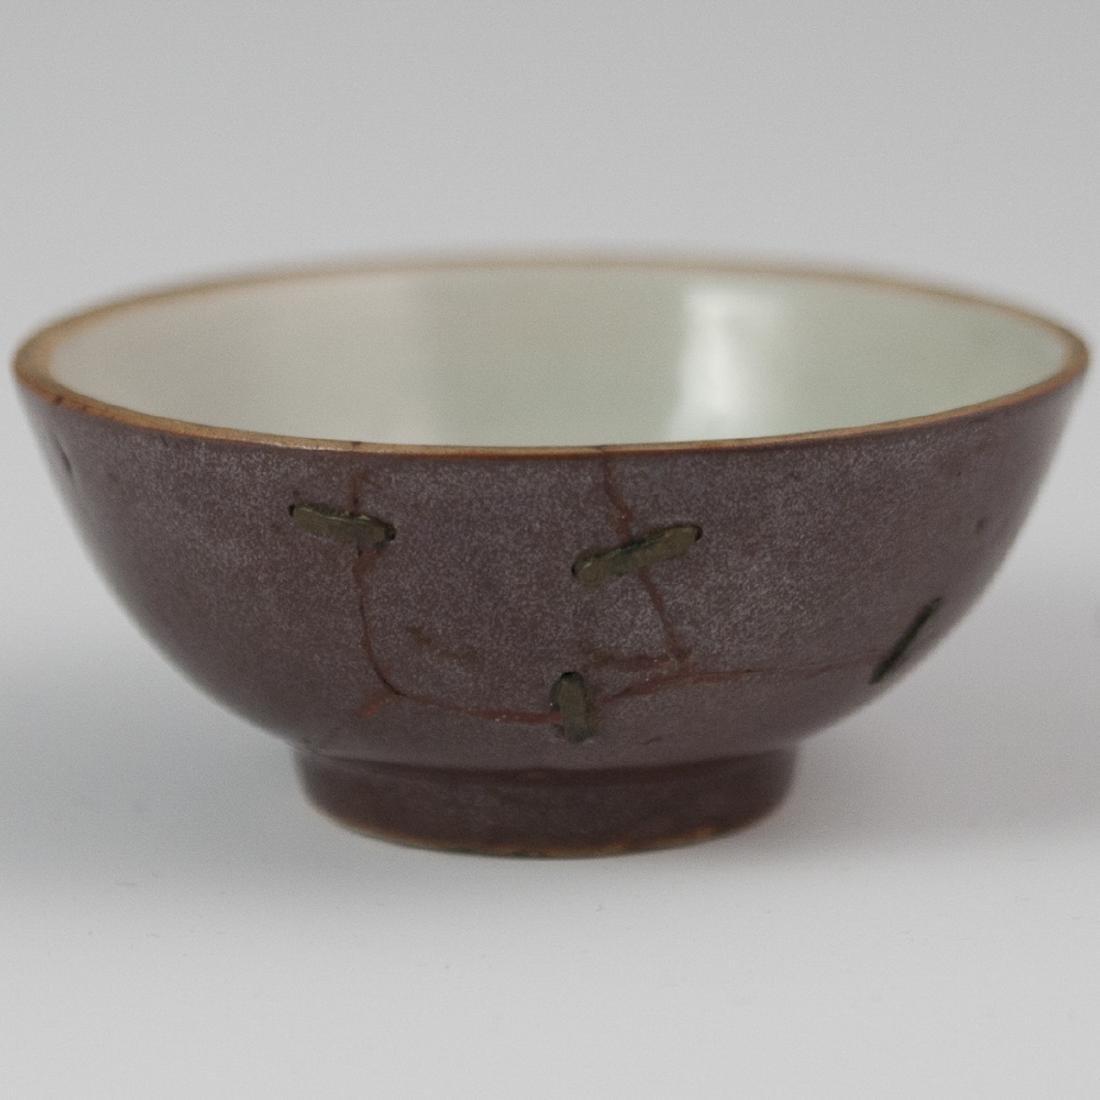 Chinese Yuan Dynasty Reddish Brown Glazed Bowl